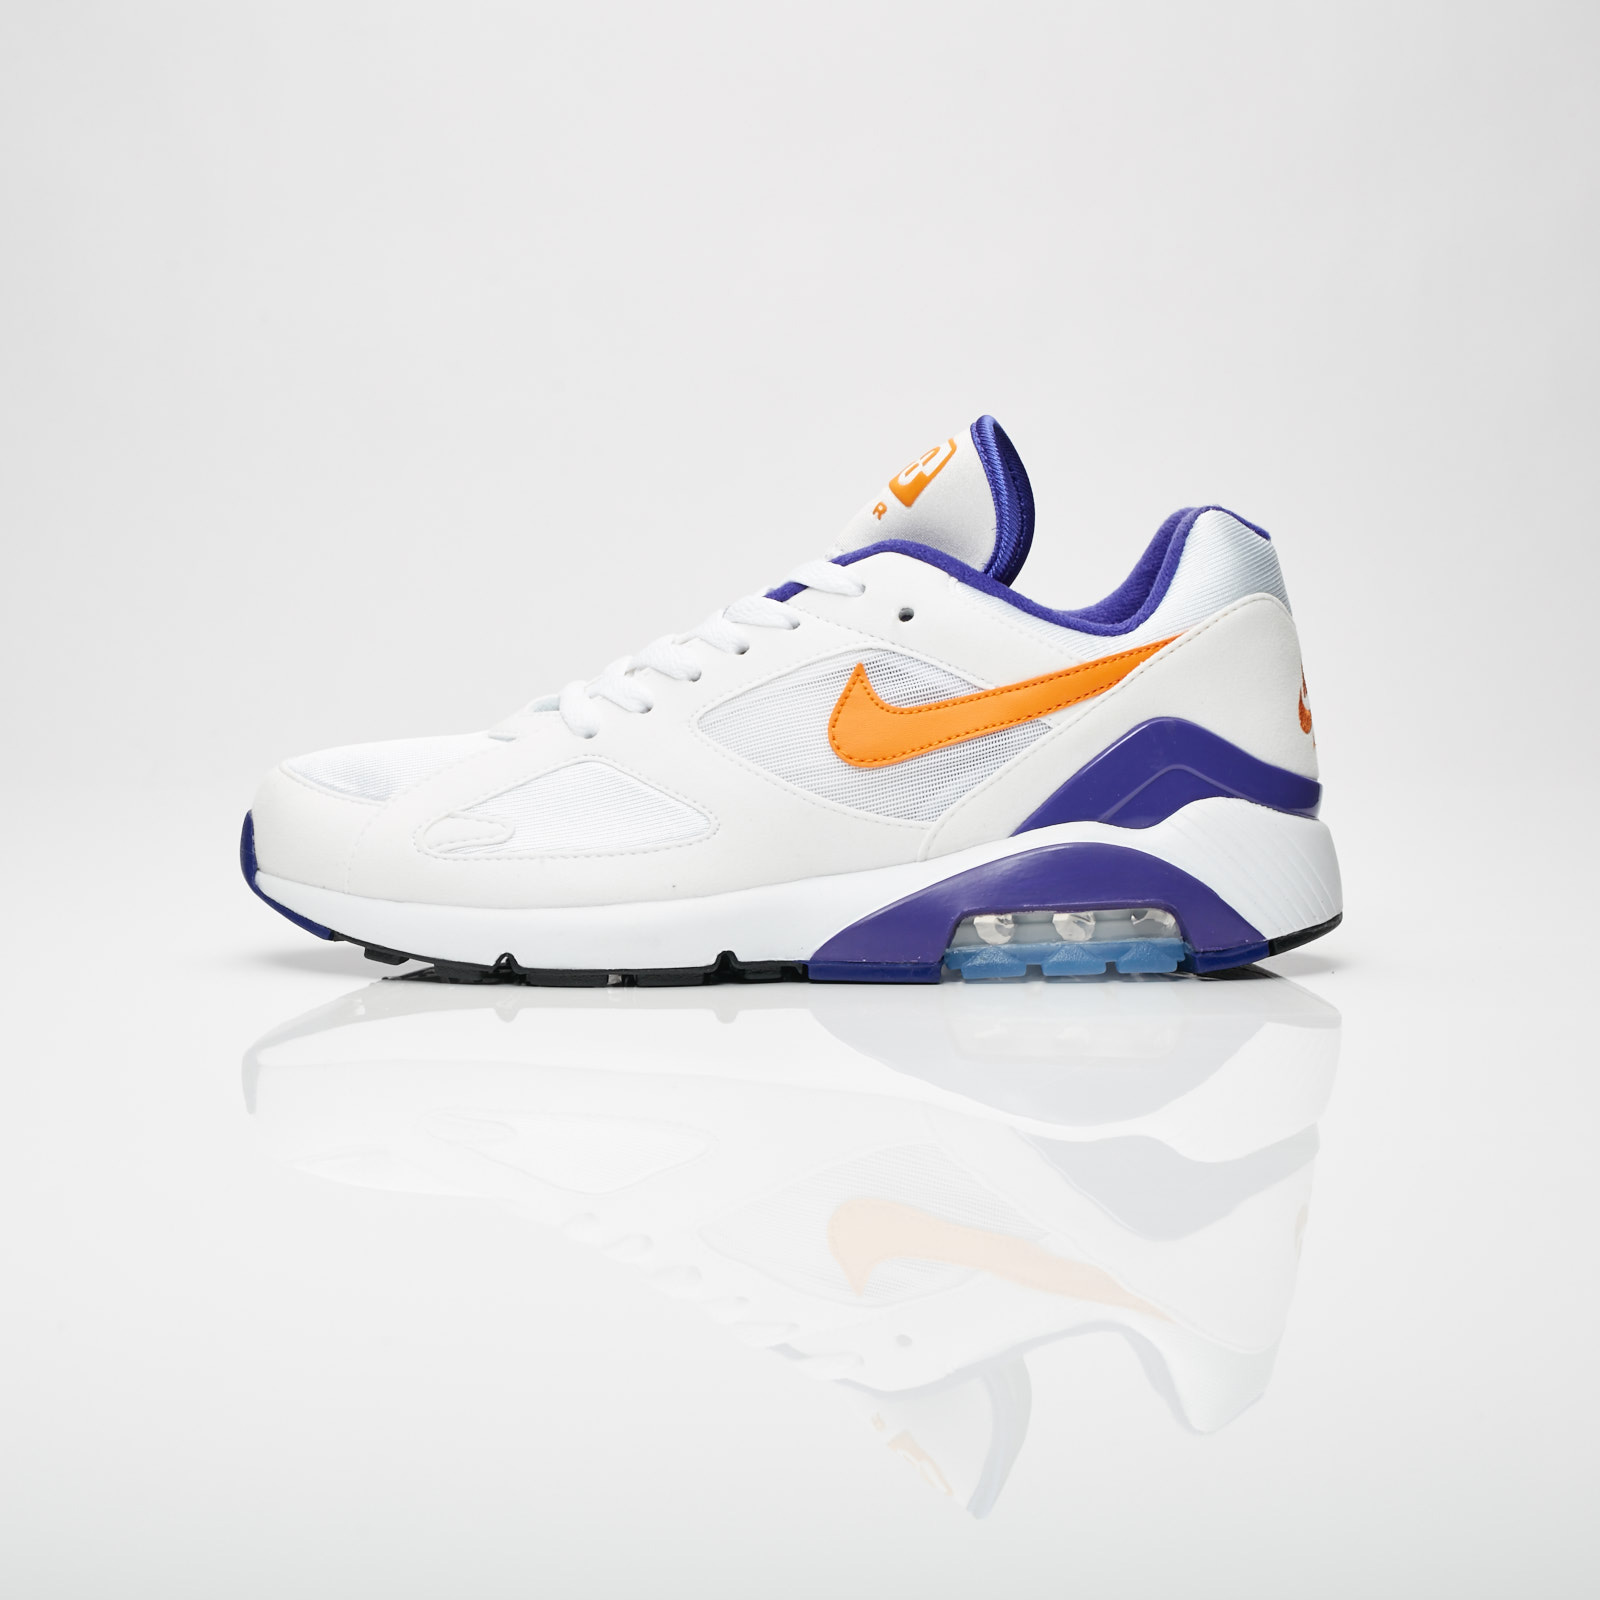 a3634a0e50 Nike Air Max 180 - 615287-101 - Sneakersnstuff | sneakers & streetwear  online since 1999